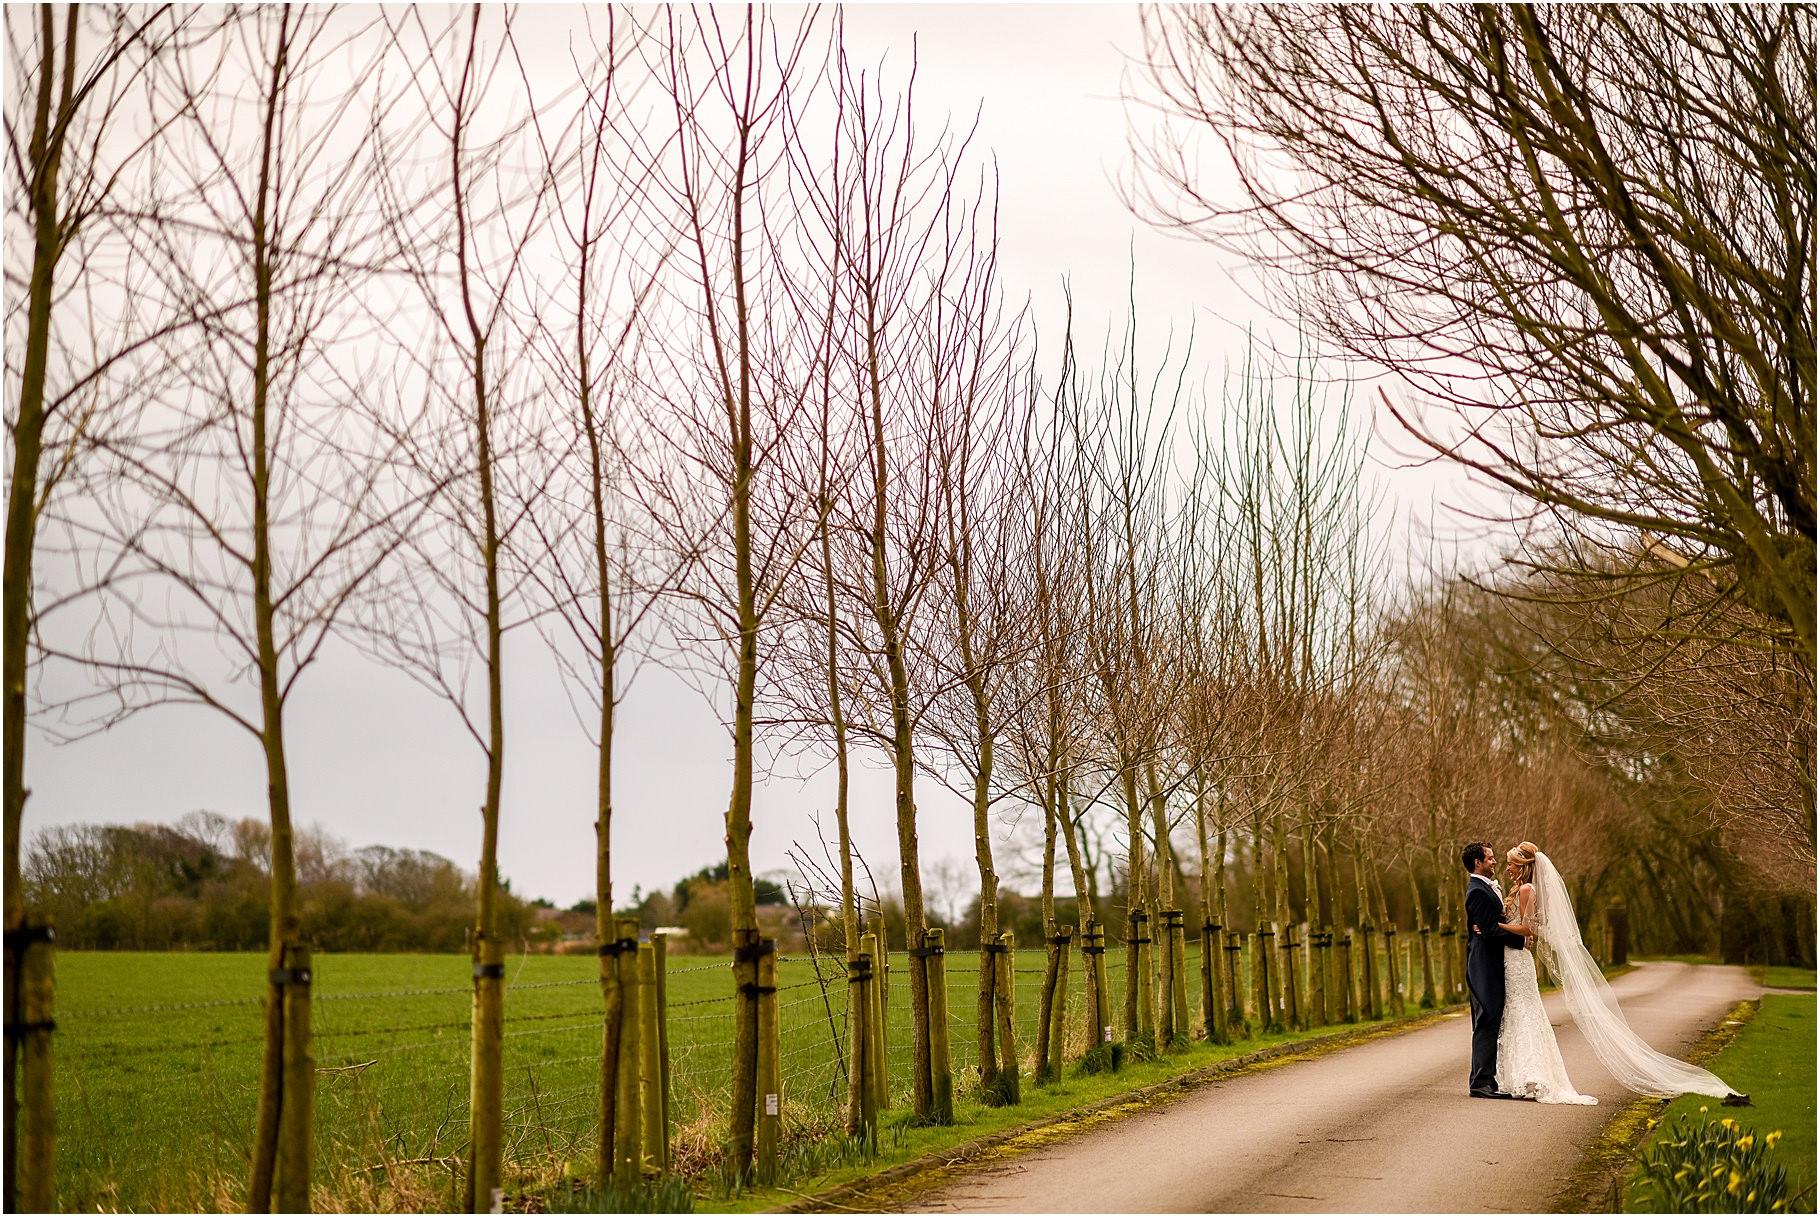 dan-wootton-photography-2017-weddings-032.jpg